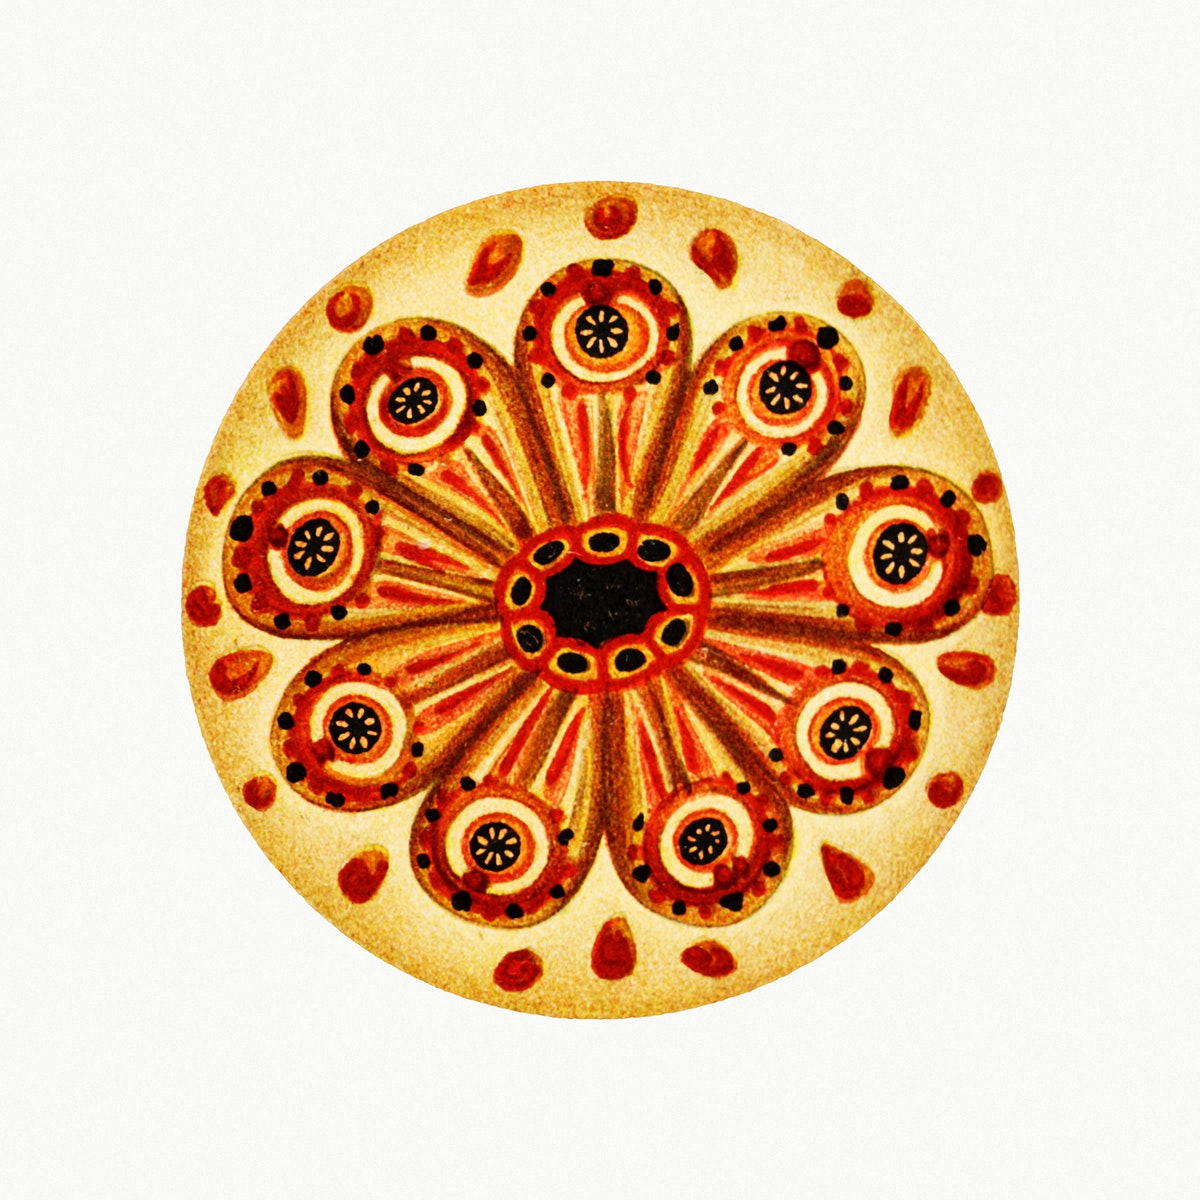 Colorful vintage tunicate ilustration